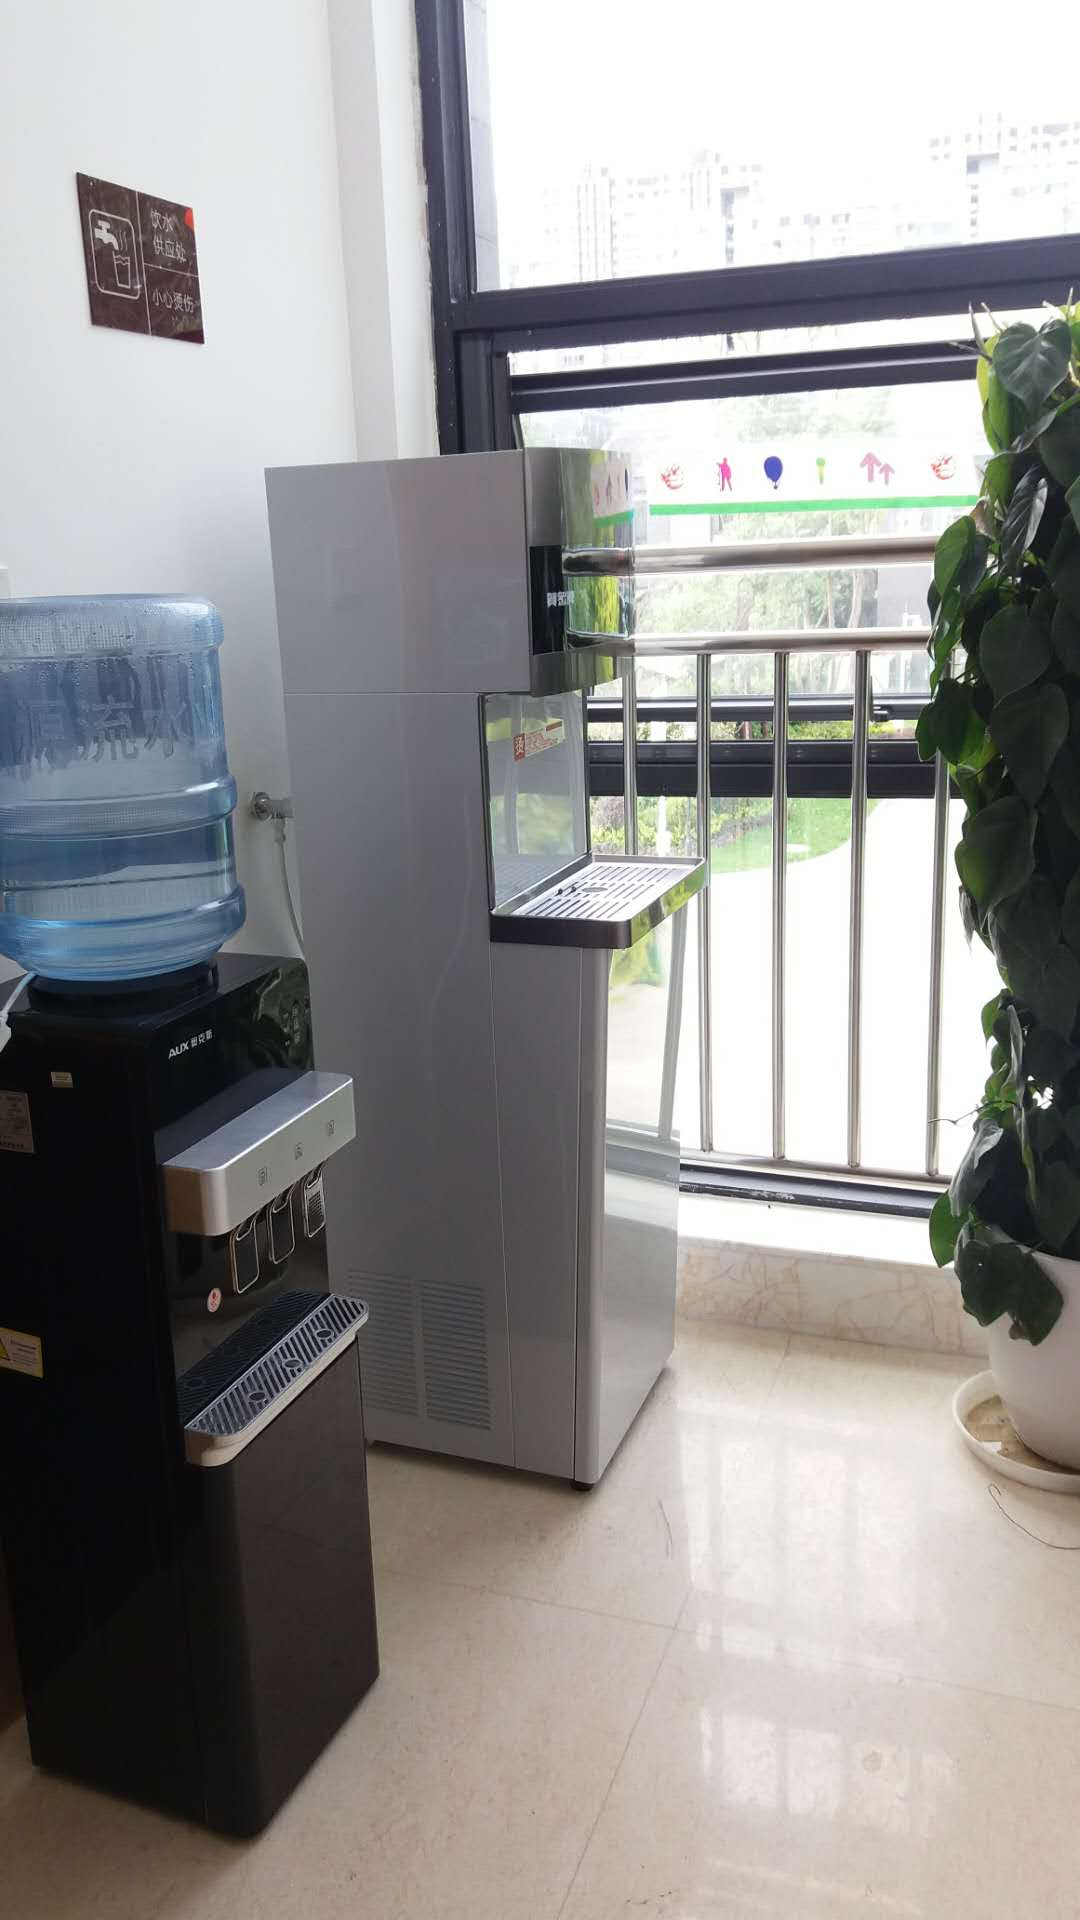 Betway必威_成都市青少年宫(锦城校区)选购betway必威app牌313机型直饮机